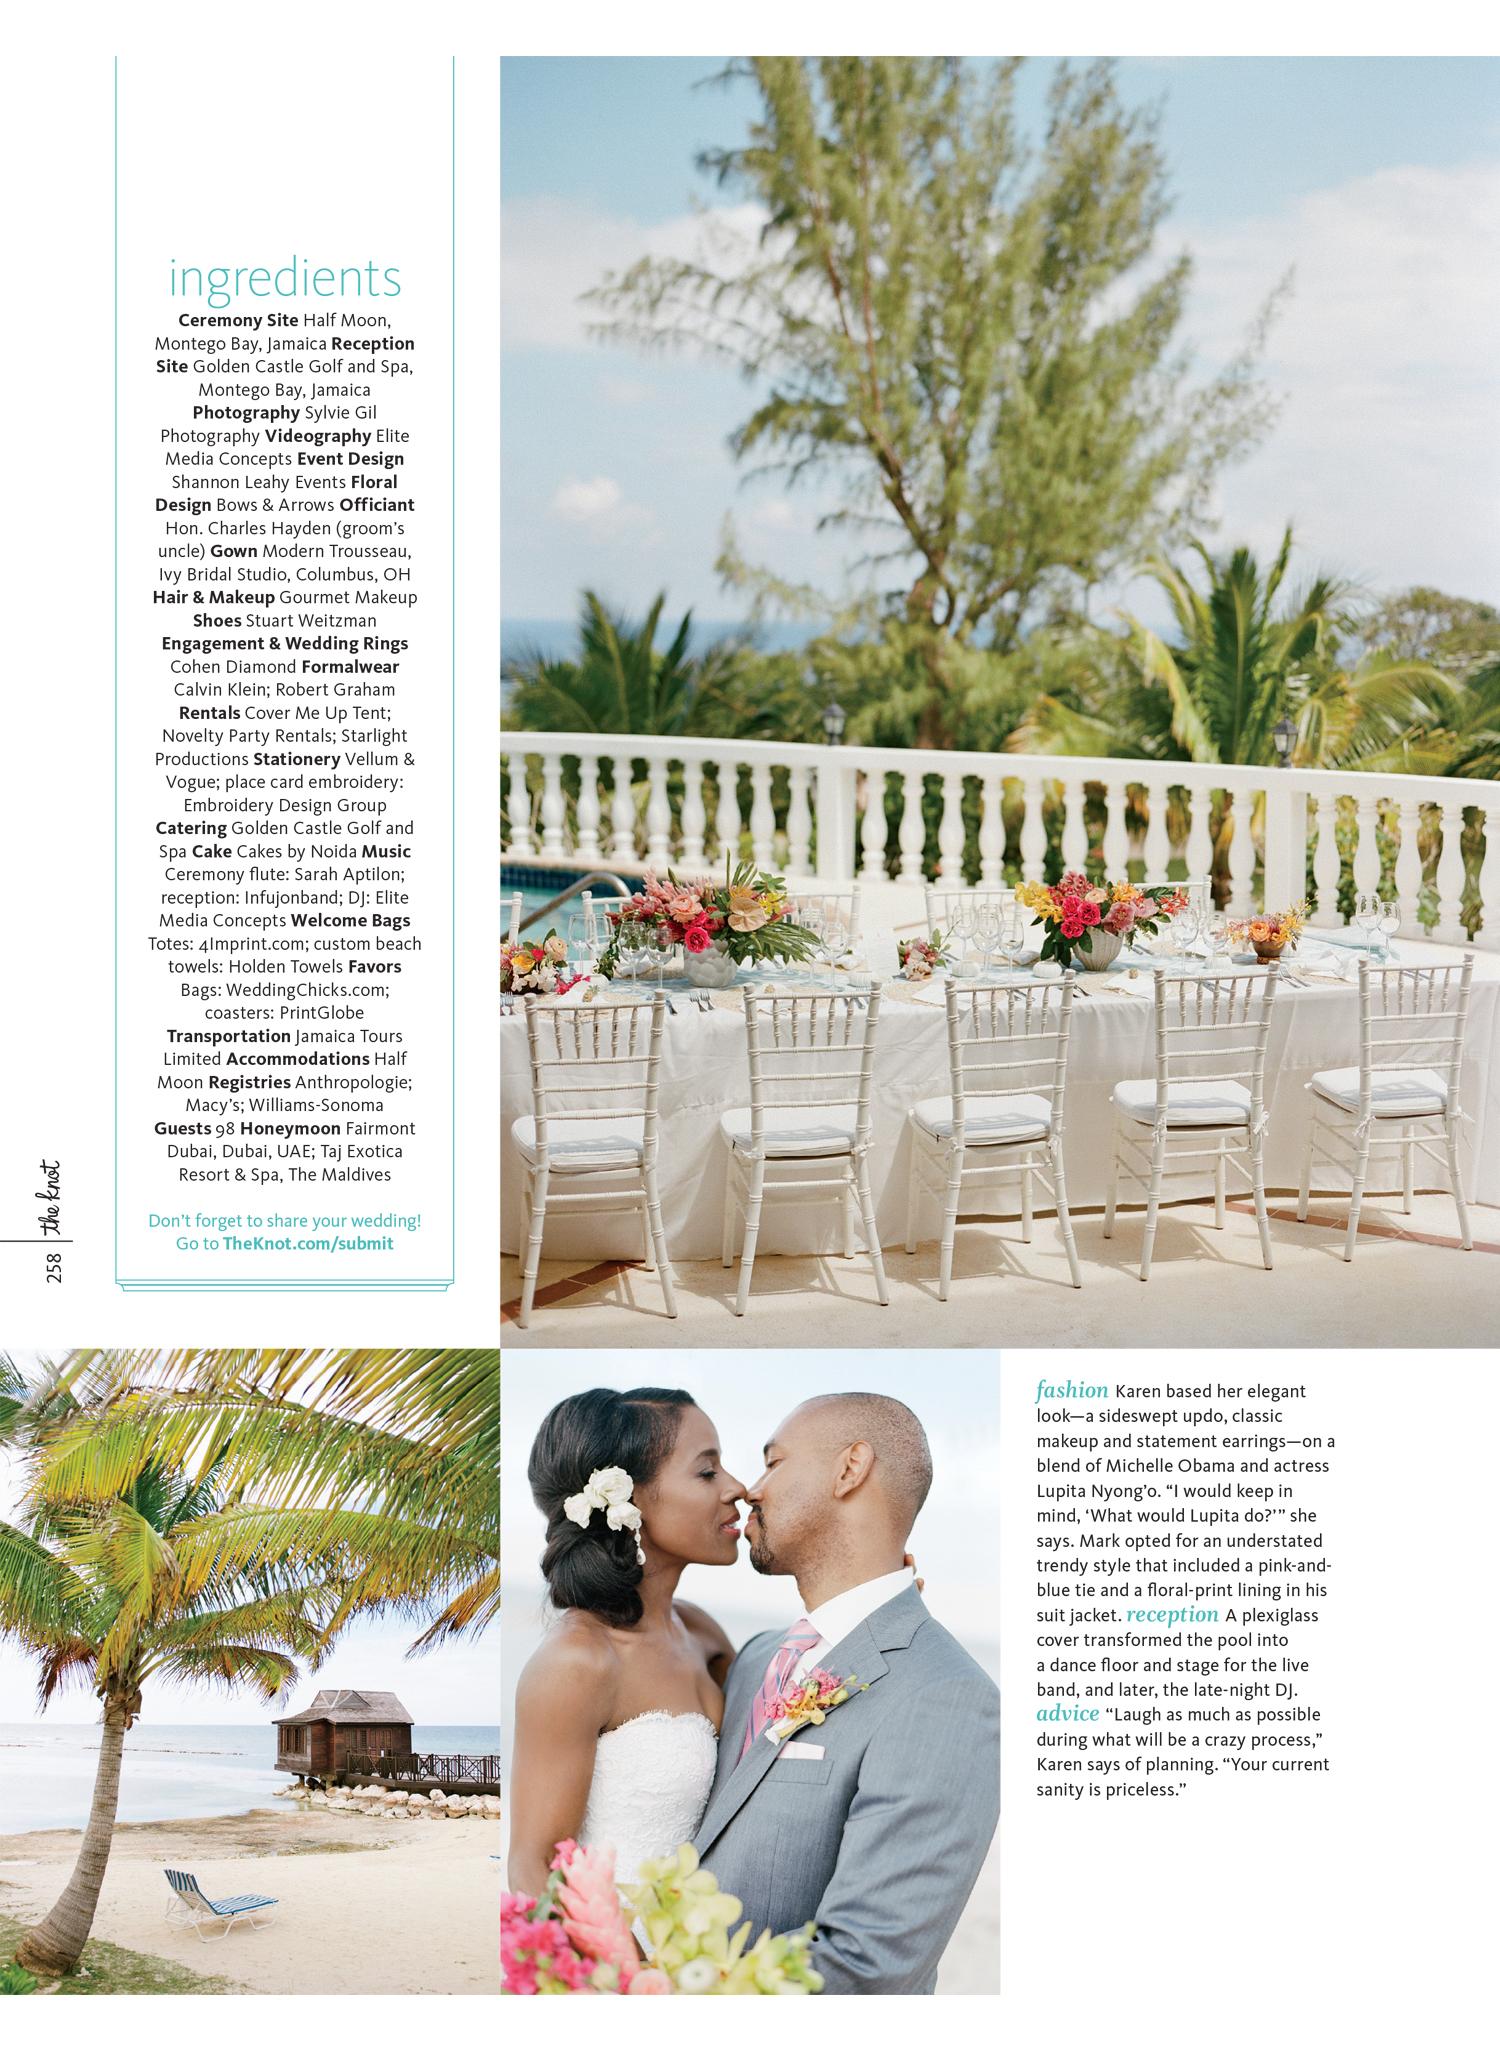 Sylvie-Gil-film-destination-wedding-photography-The-Knot-Karen-Mark-7